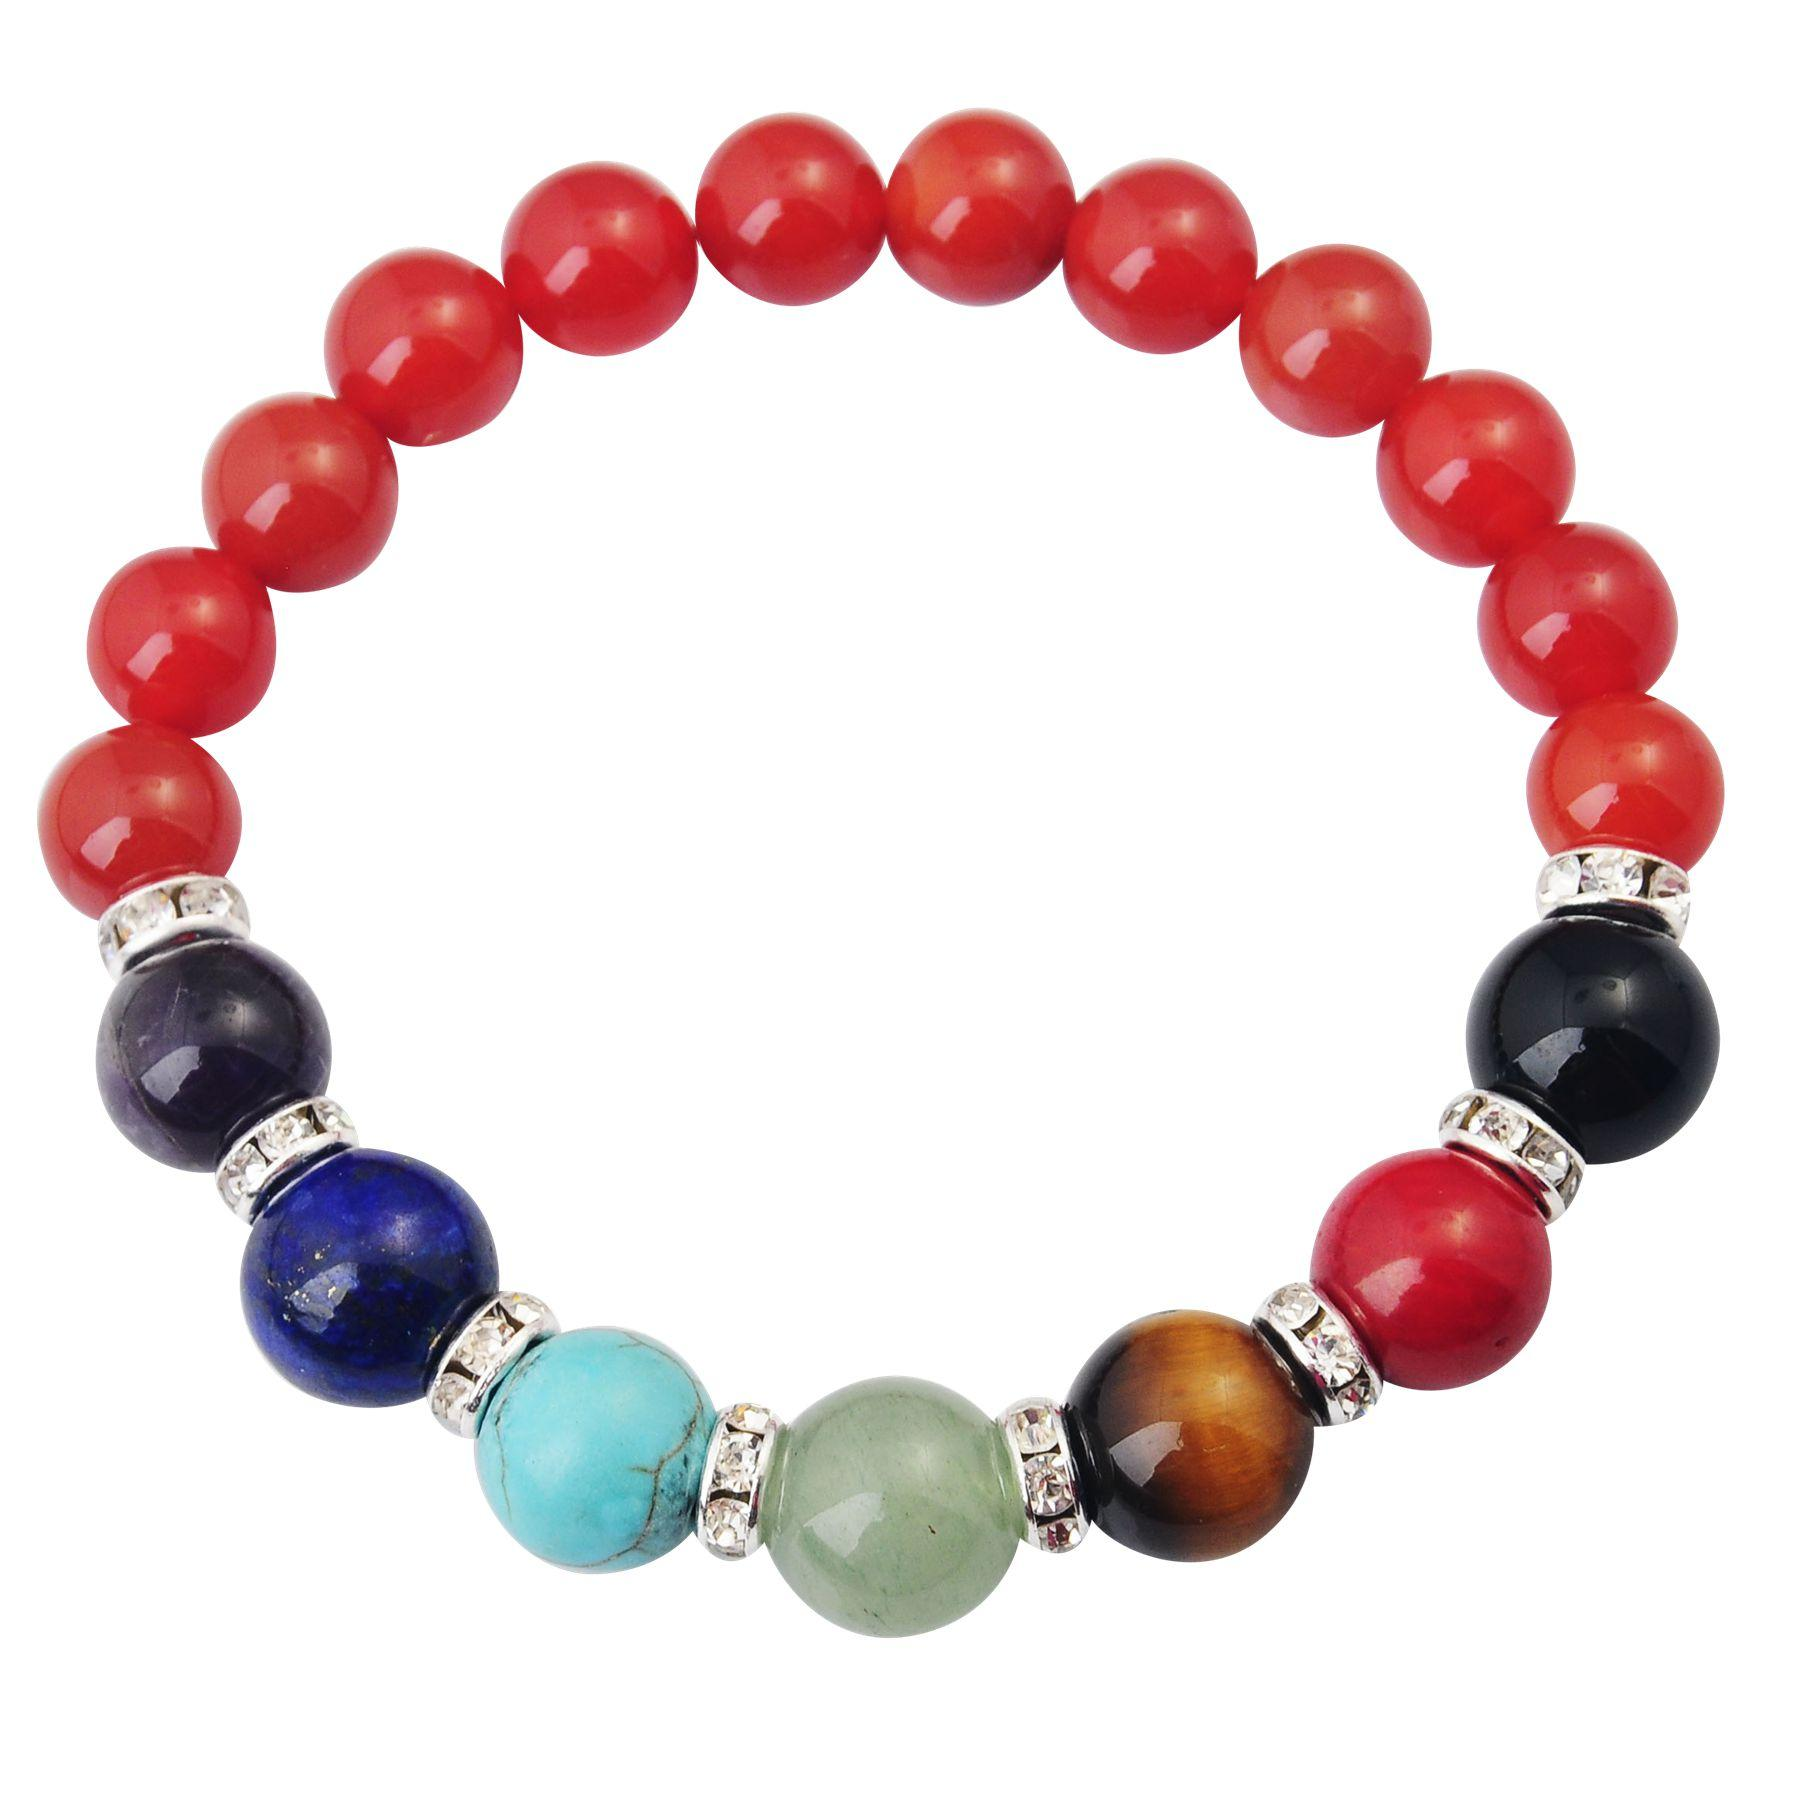 Joya Gift 14SB1037-8MM Natural Rose Quartz Beads bracelet 7 Chakra Gemstone Crystal Healing Reiki women jewelry bangle